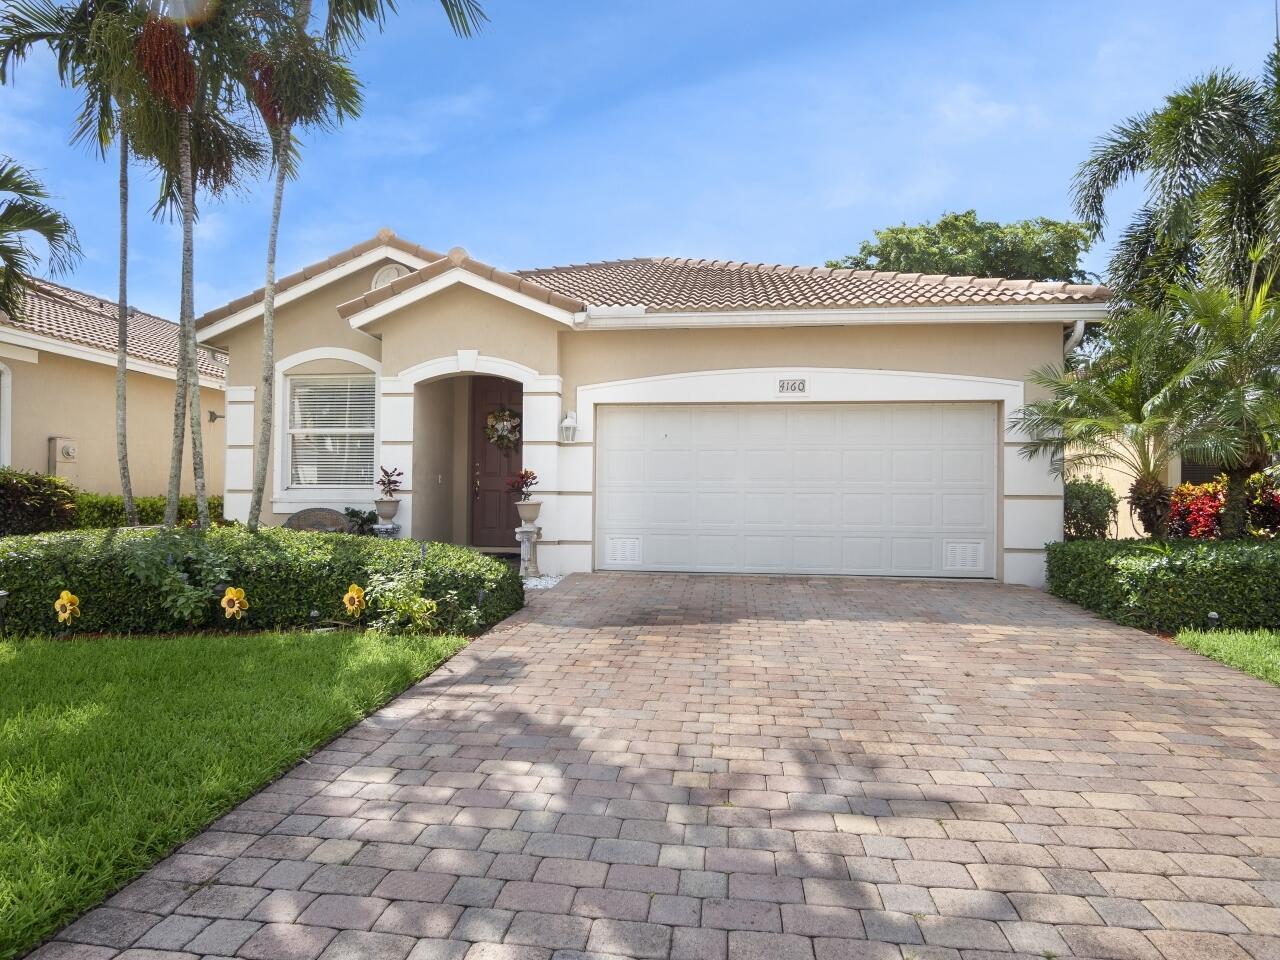 4160  Key Lime Boulevard  For Sale 10753272, FL